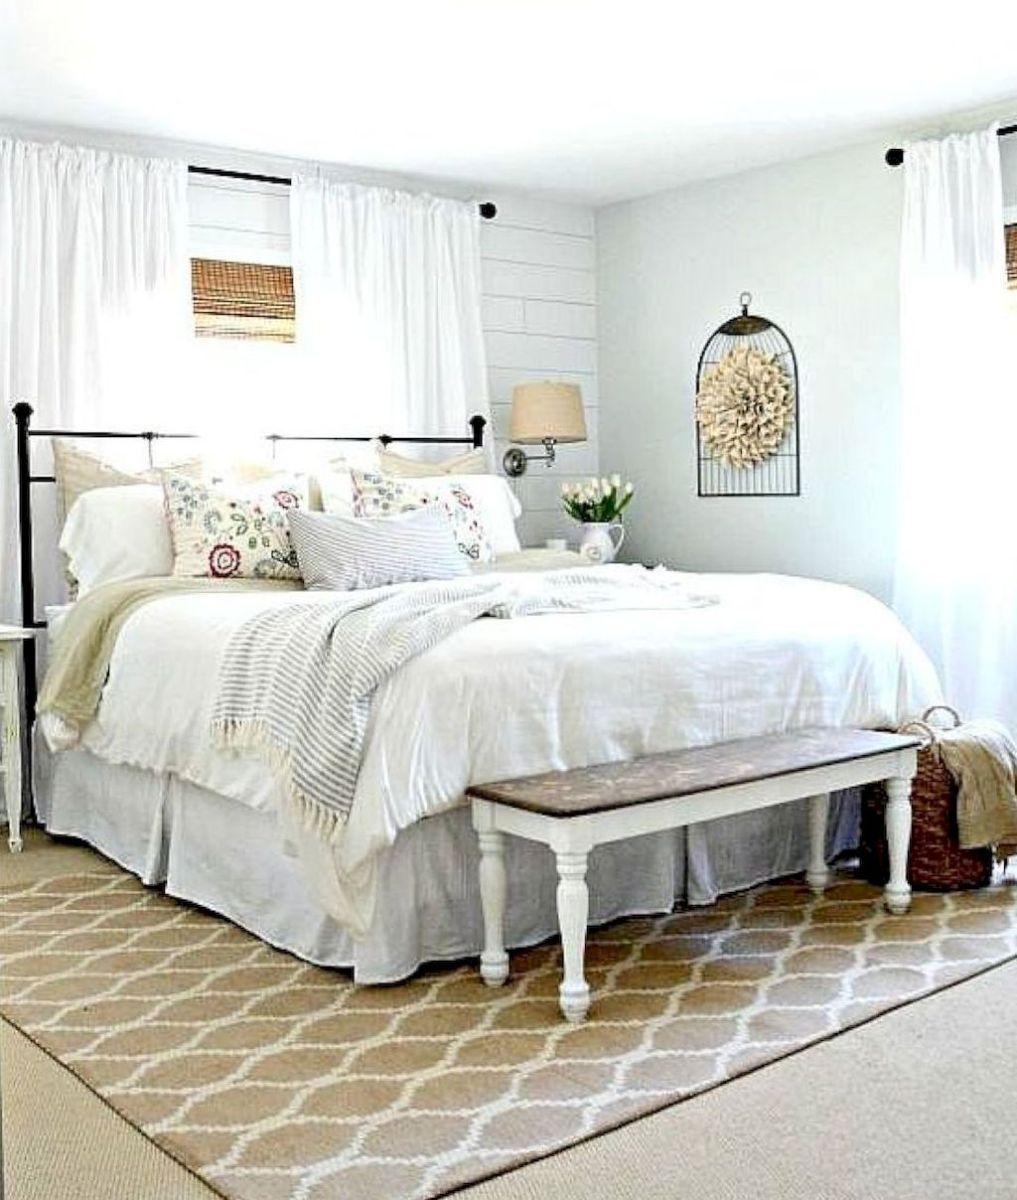 best modern farmhouse bedroom design ideas 8 modern on modern farmhouse master bedroom ideas id=24861